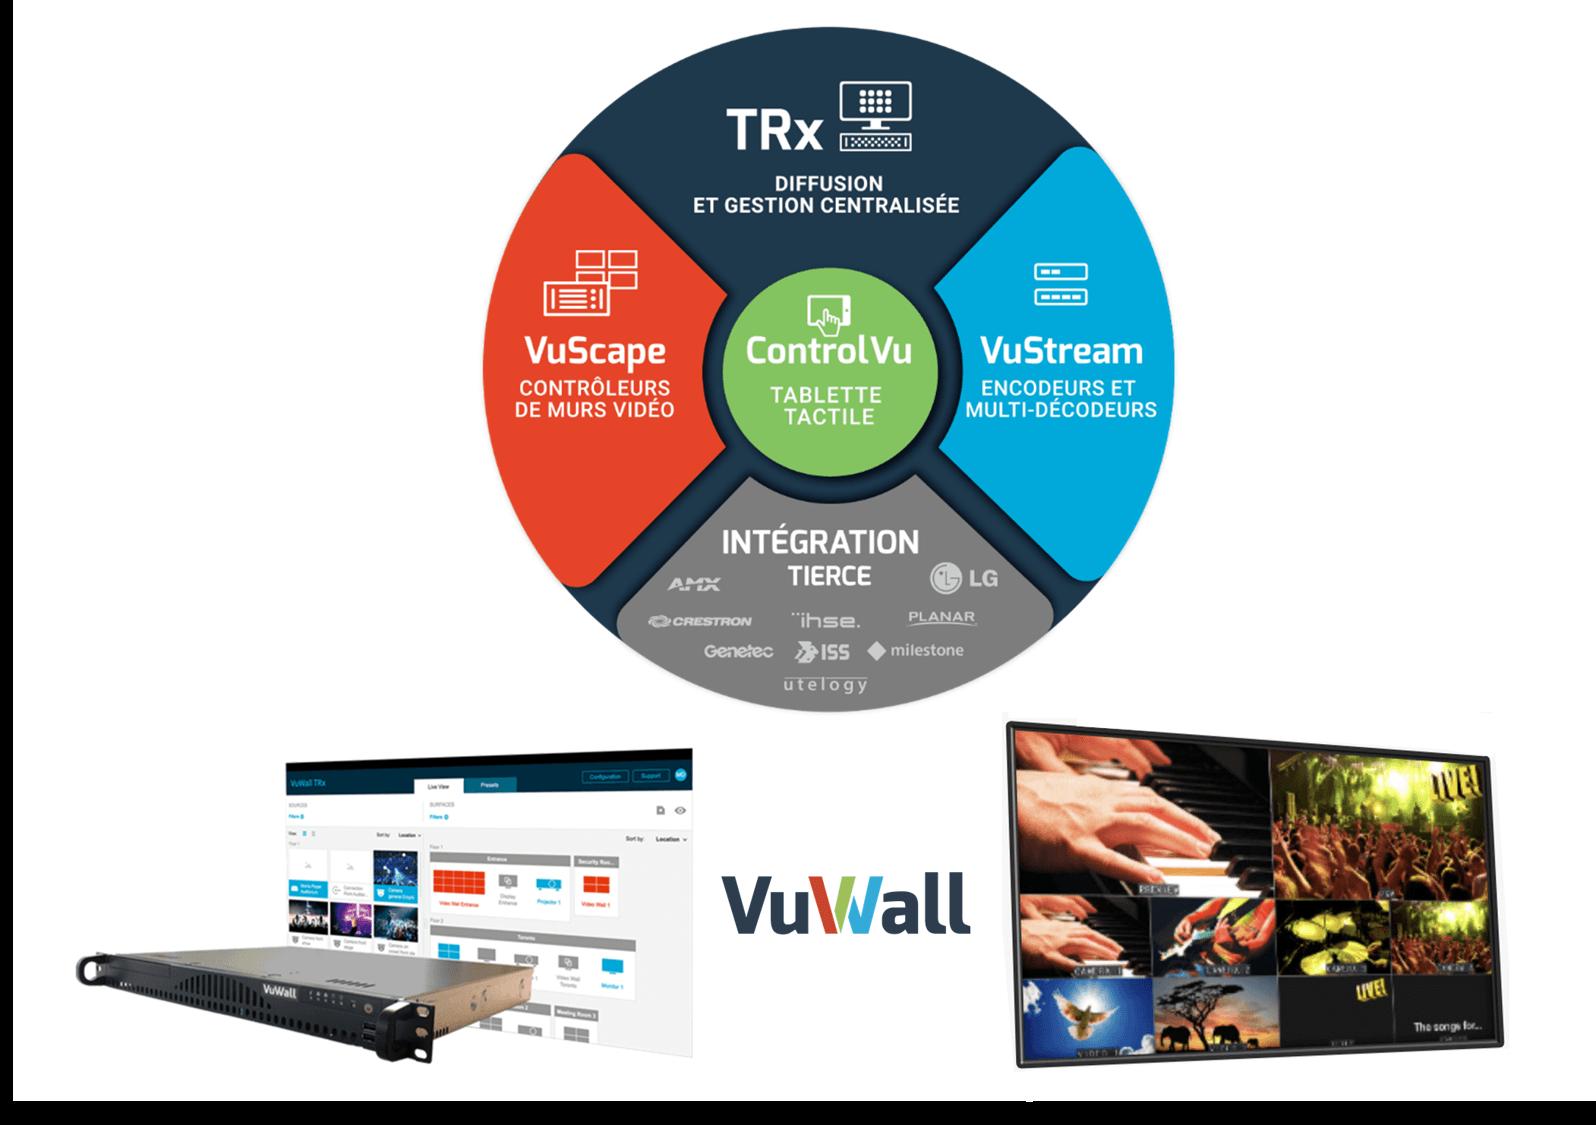 TRX-VUWALL-ECOSYSTEME-DIFFUSION-AFFICHAGE-IP-CONVERGENCIE-compressor